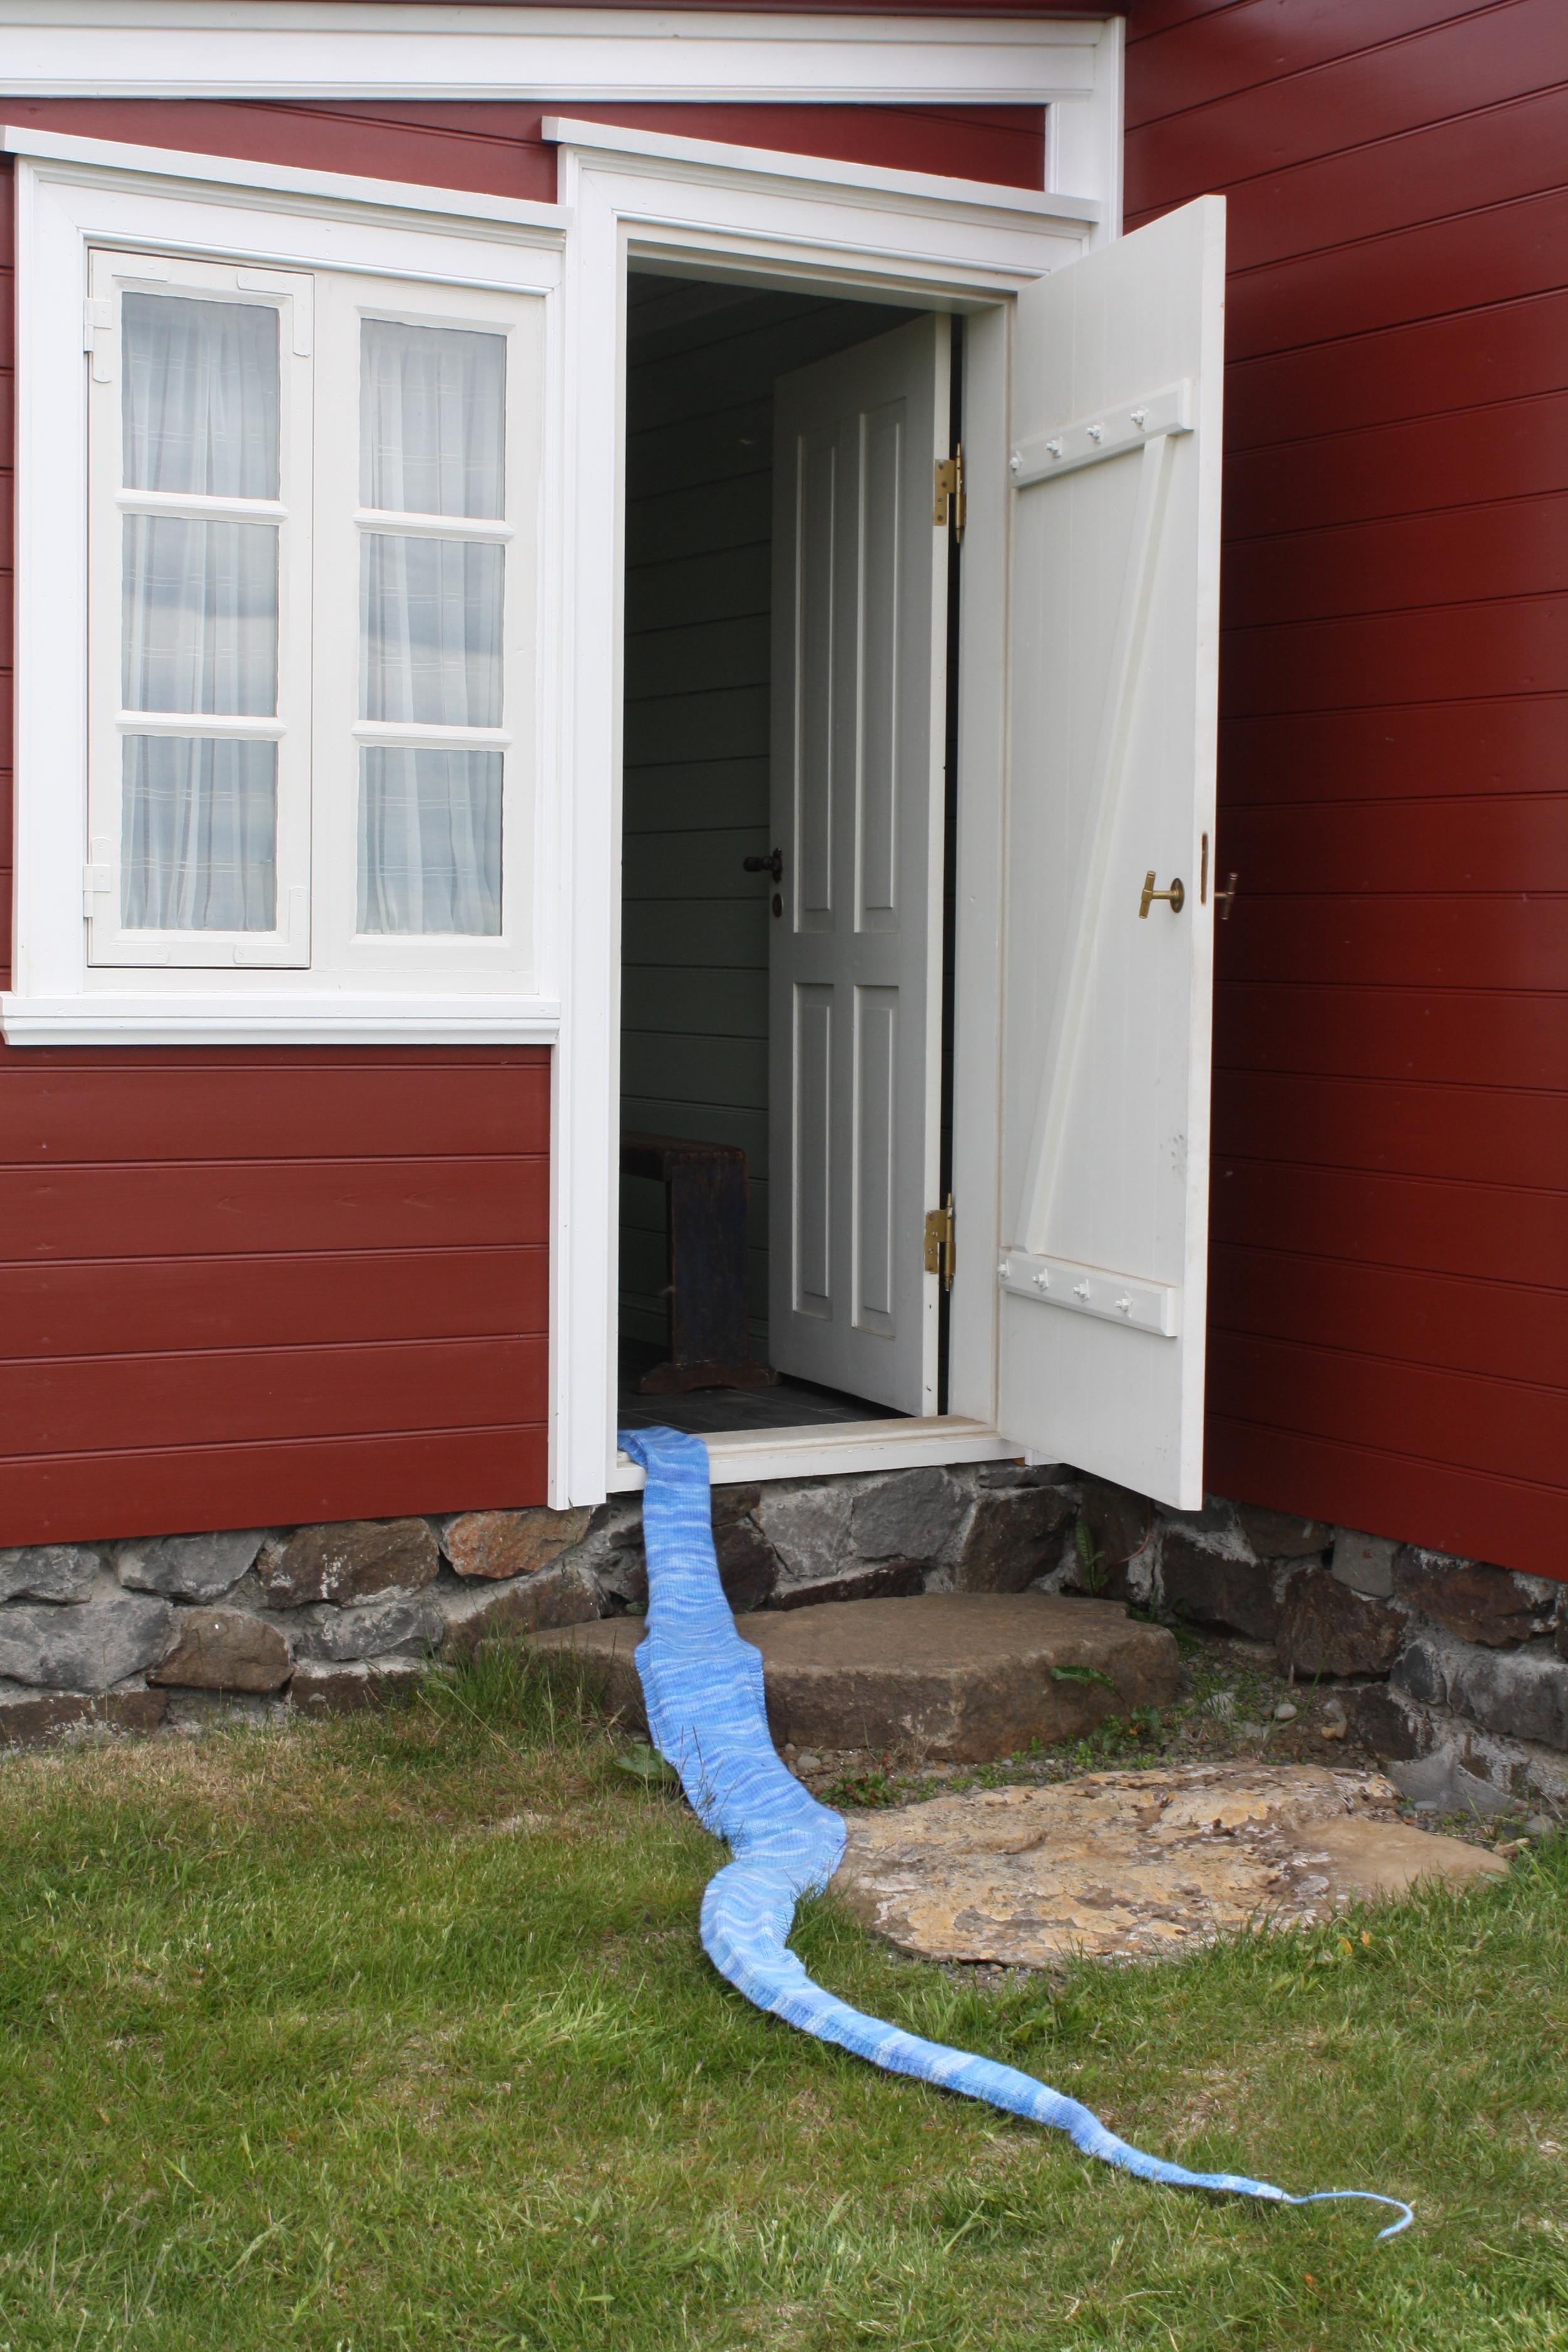 Installation at the Arnes Museum, Skagastrond, Iceland, June 2011